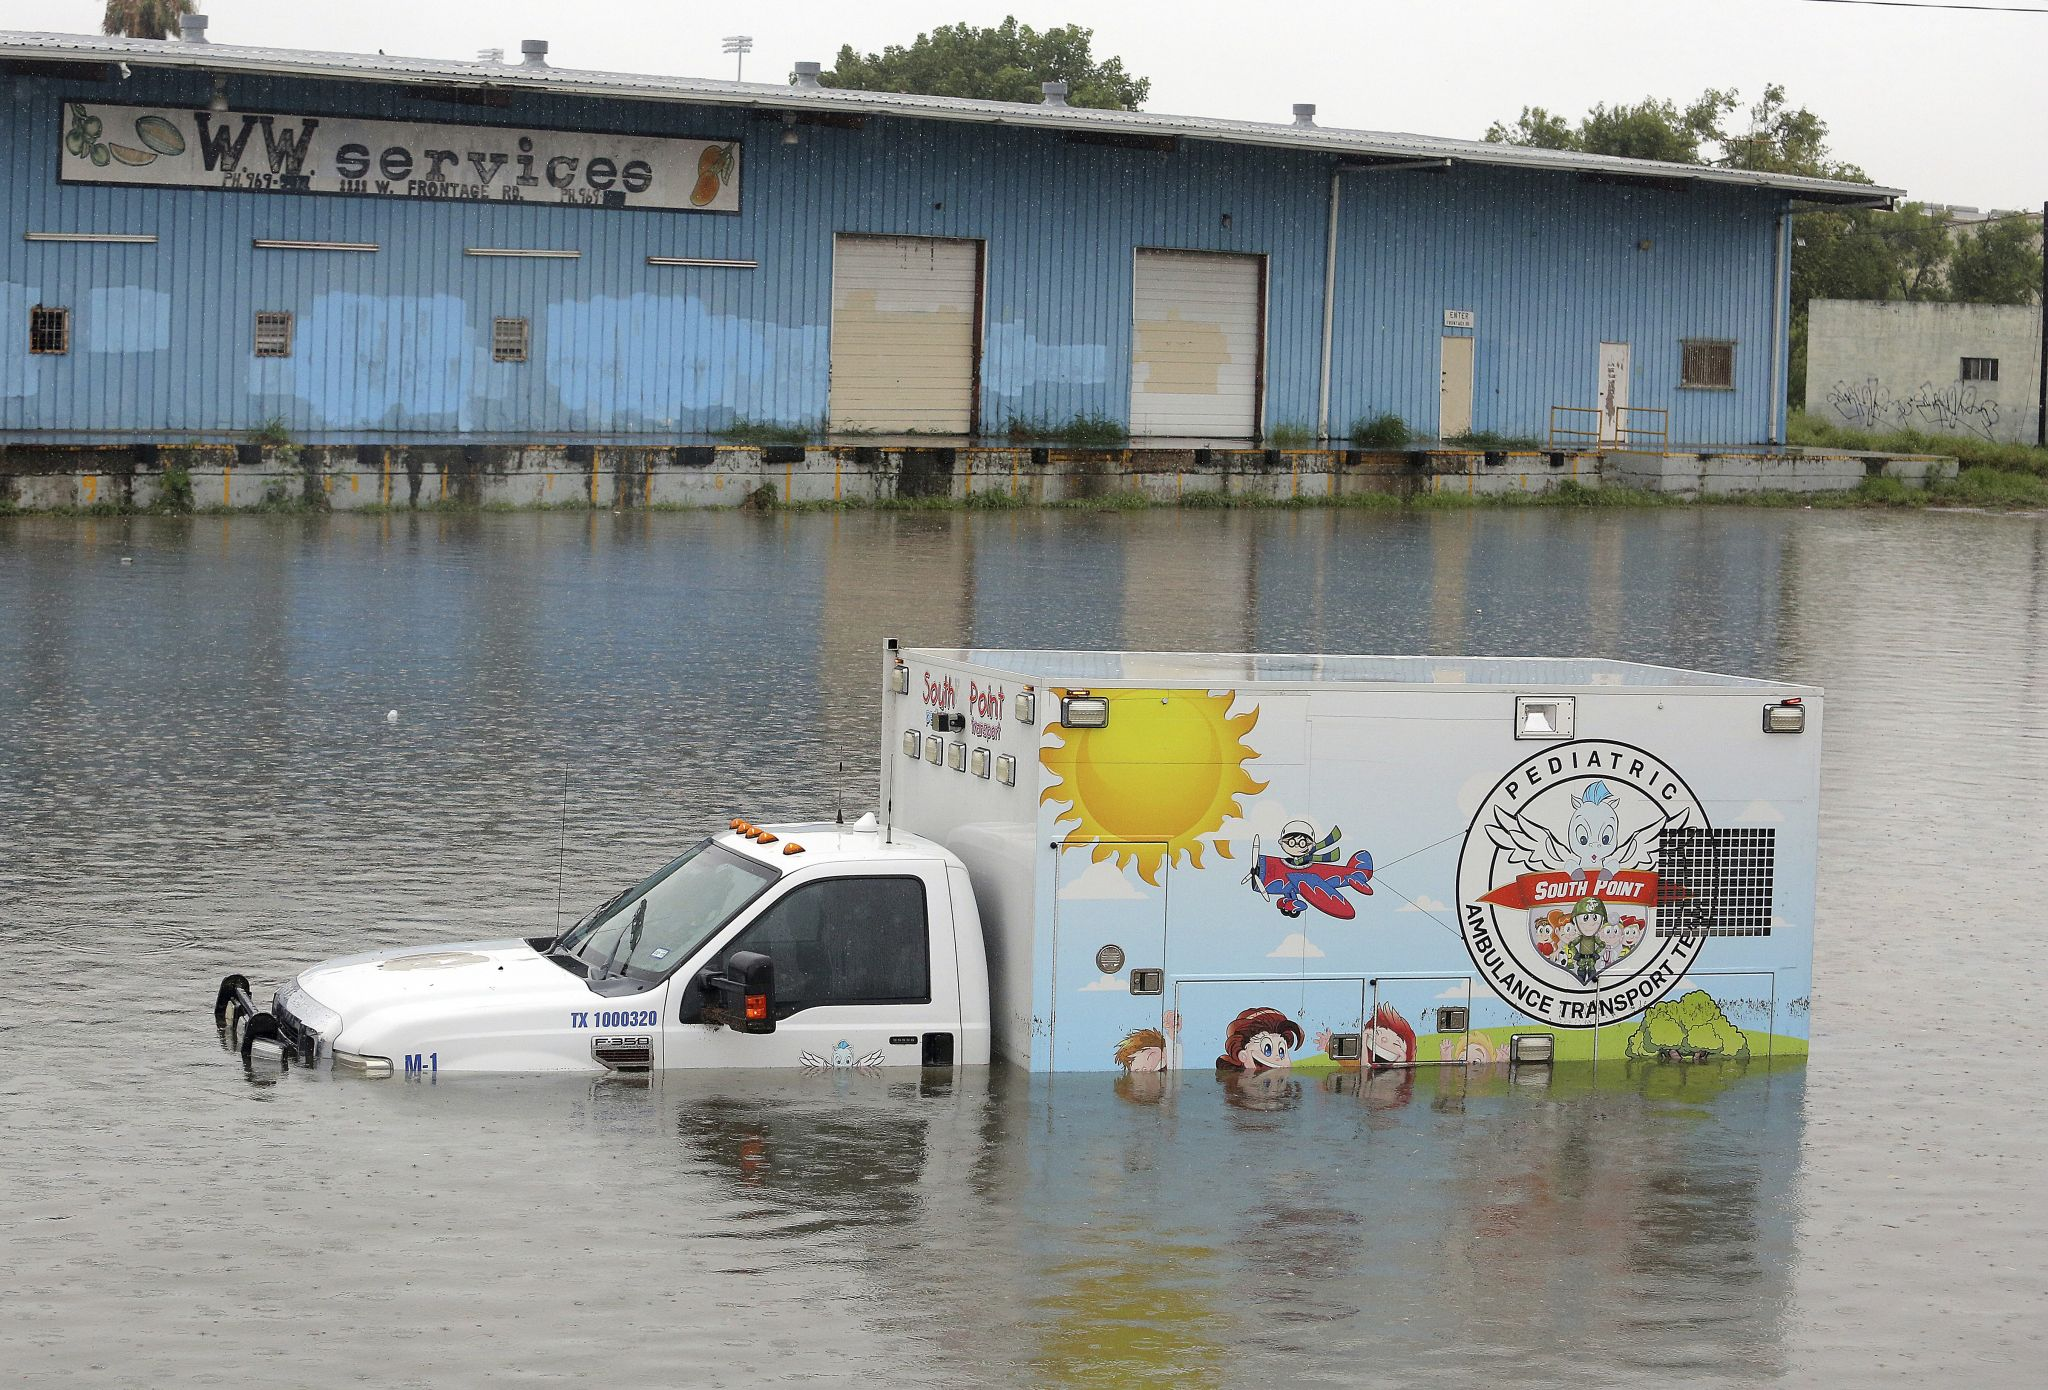 Gov Abbott Issues Disaster Declaration For Severe Flooding Across South Texas San Antonio Express News